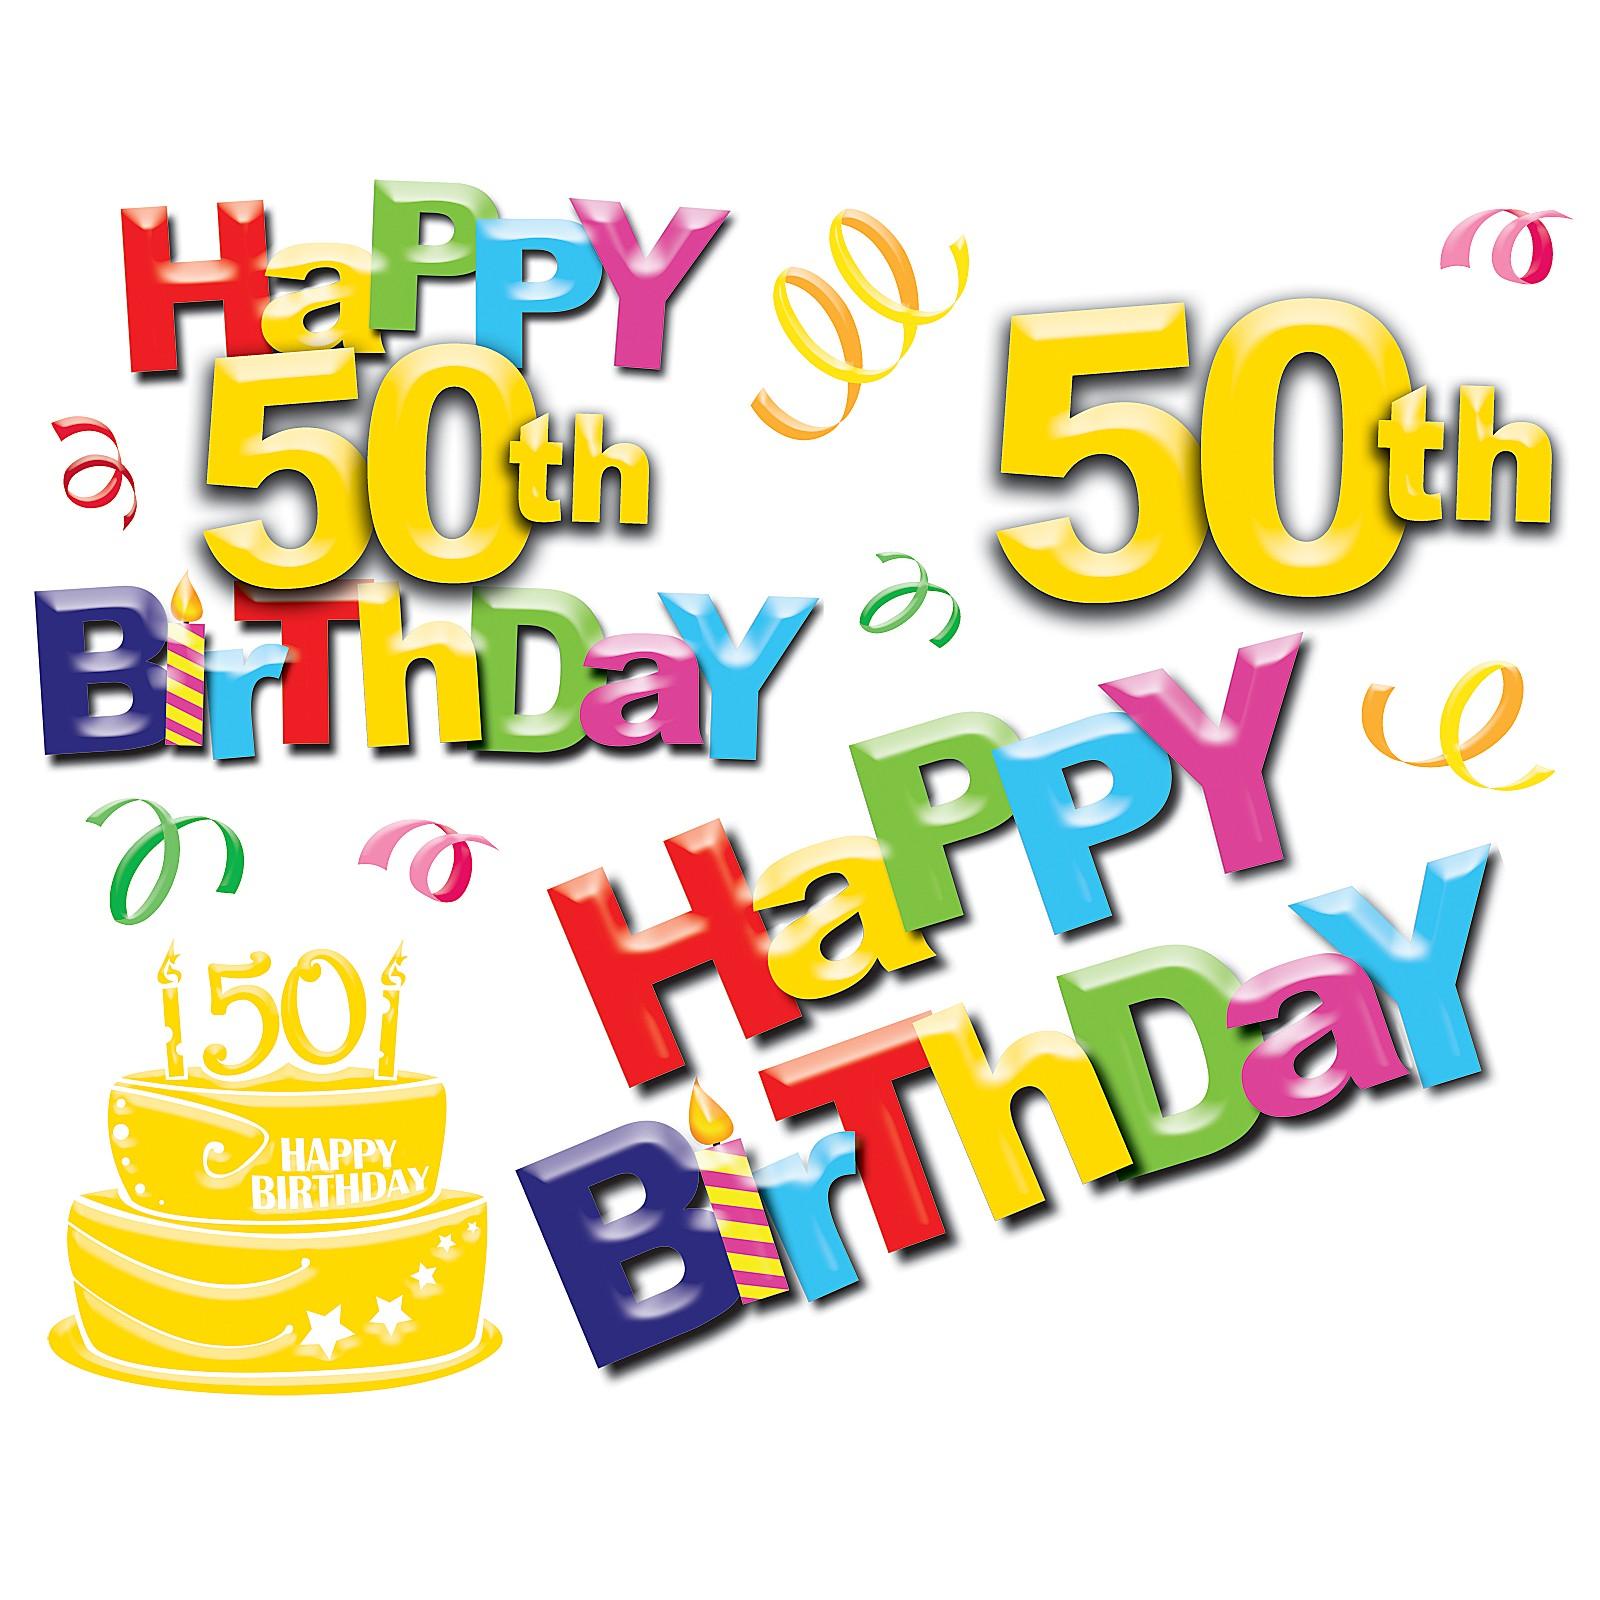 Old clipart 50 year Old the Birthday birthday man